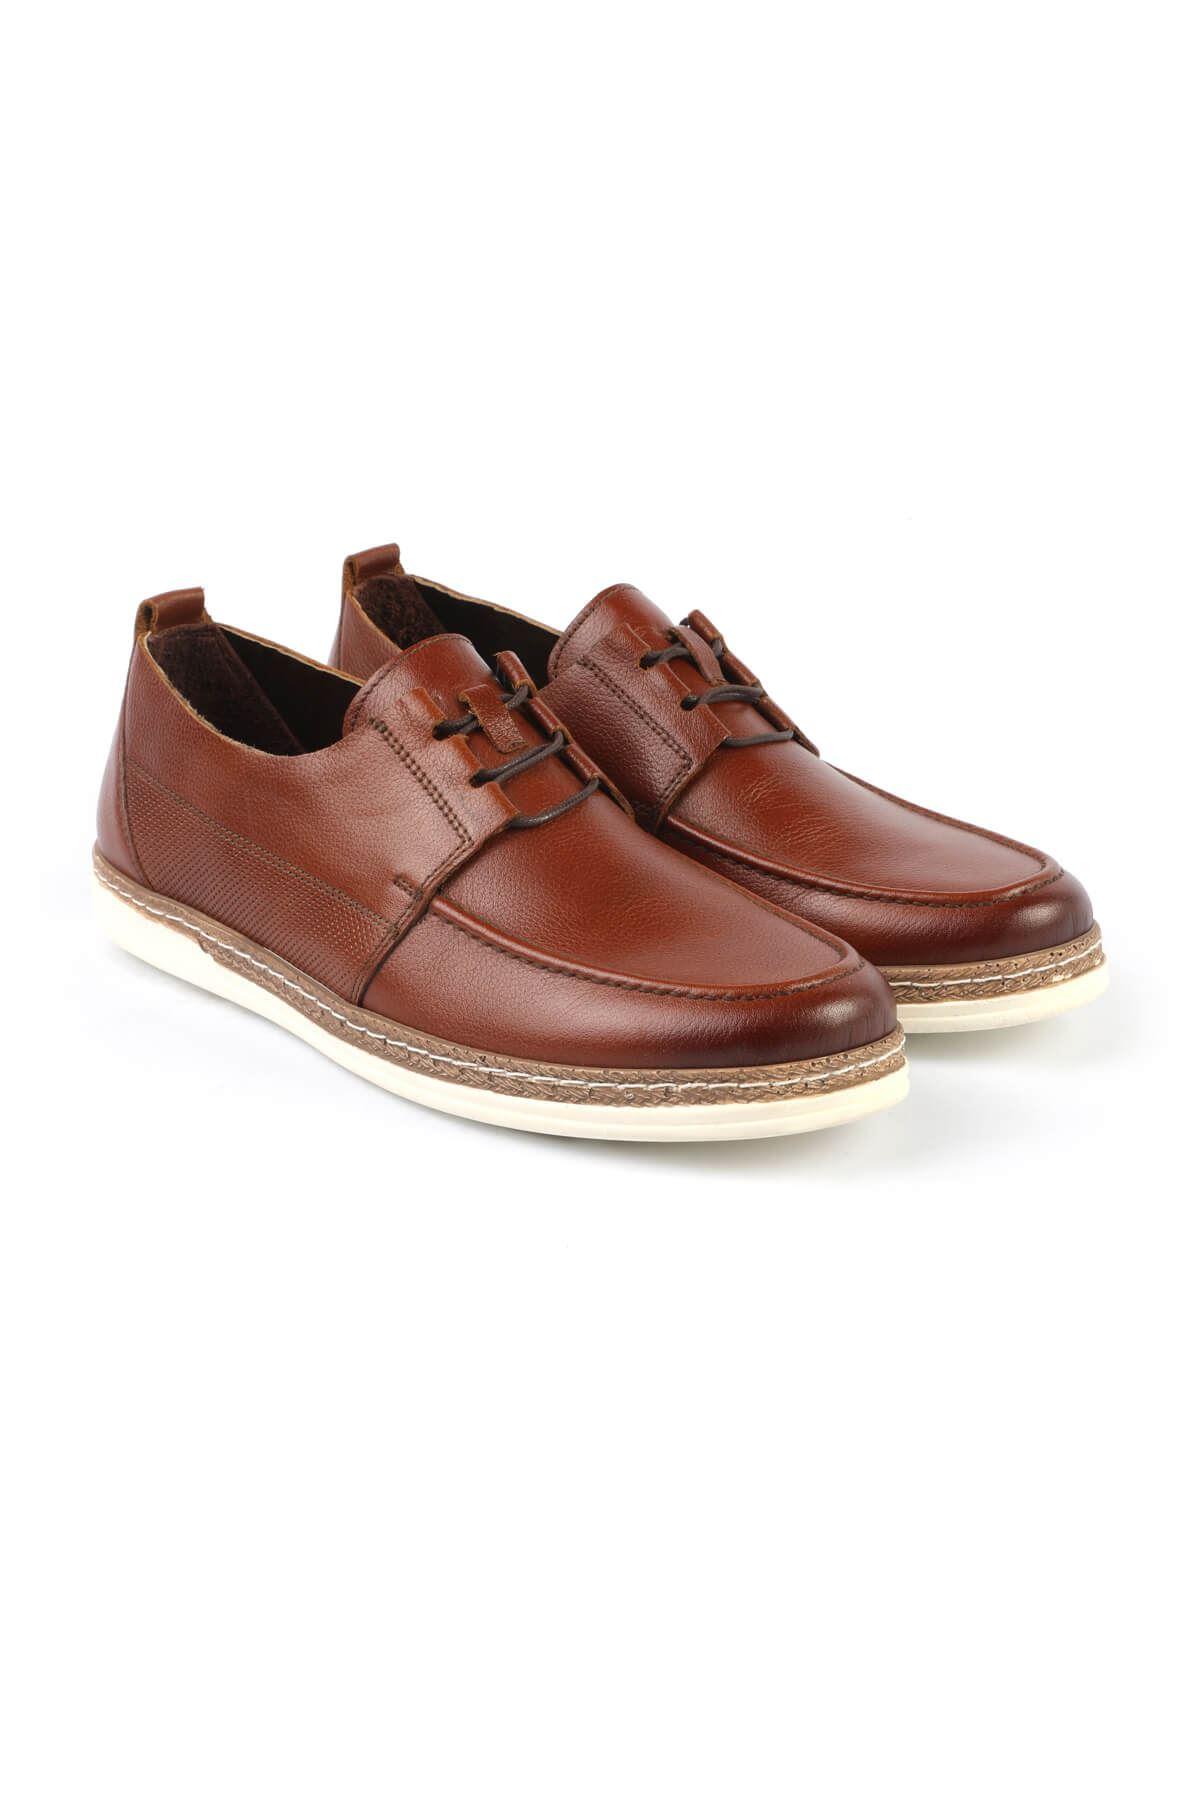 Libero C626 Tan Casual Shoes